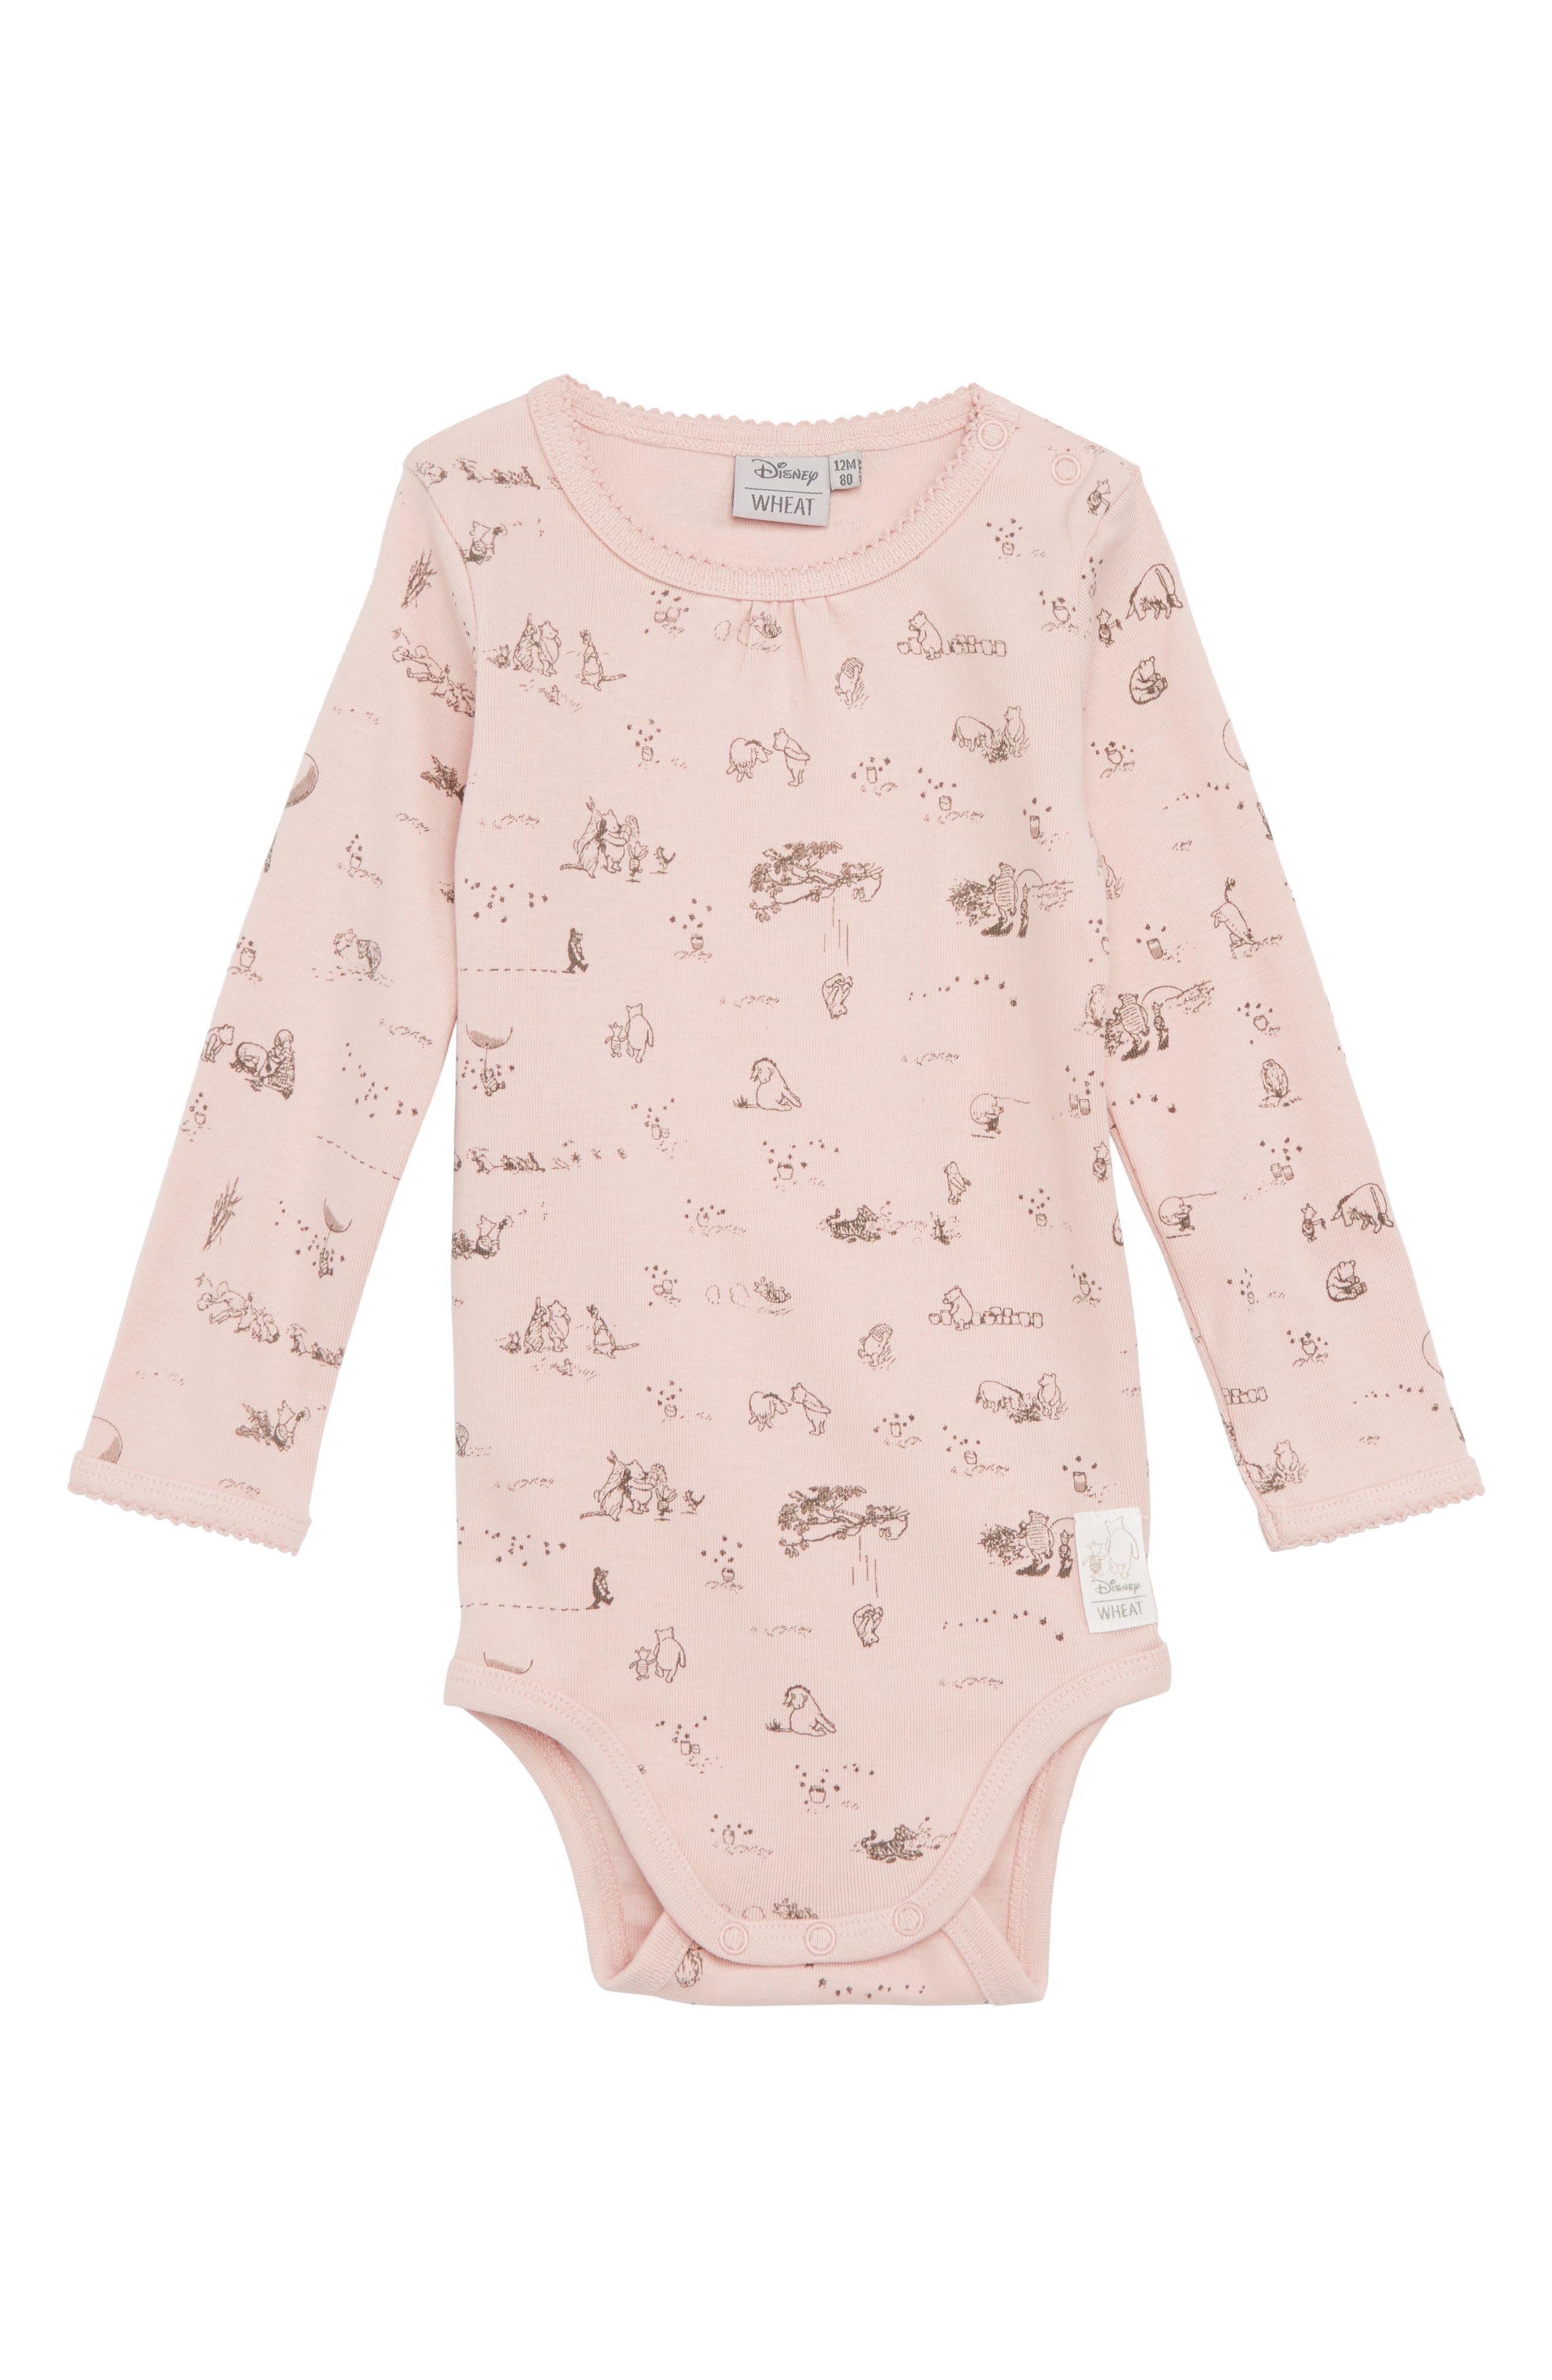 x Disney<sup>®</sup> Winnie the Pooh Organic Cotton Bodysuit,                             Main thumbnail 1, color,                             Powder